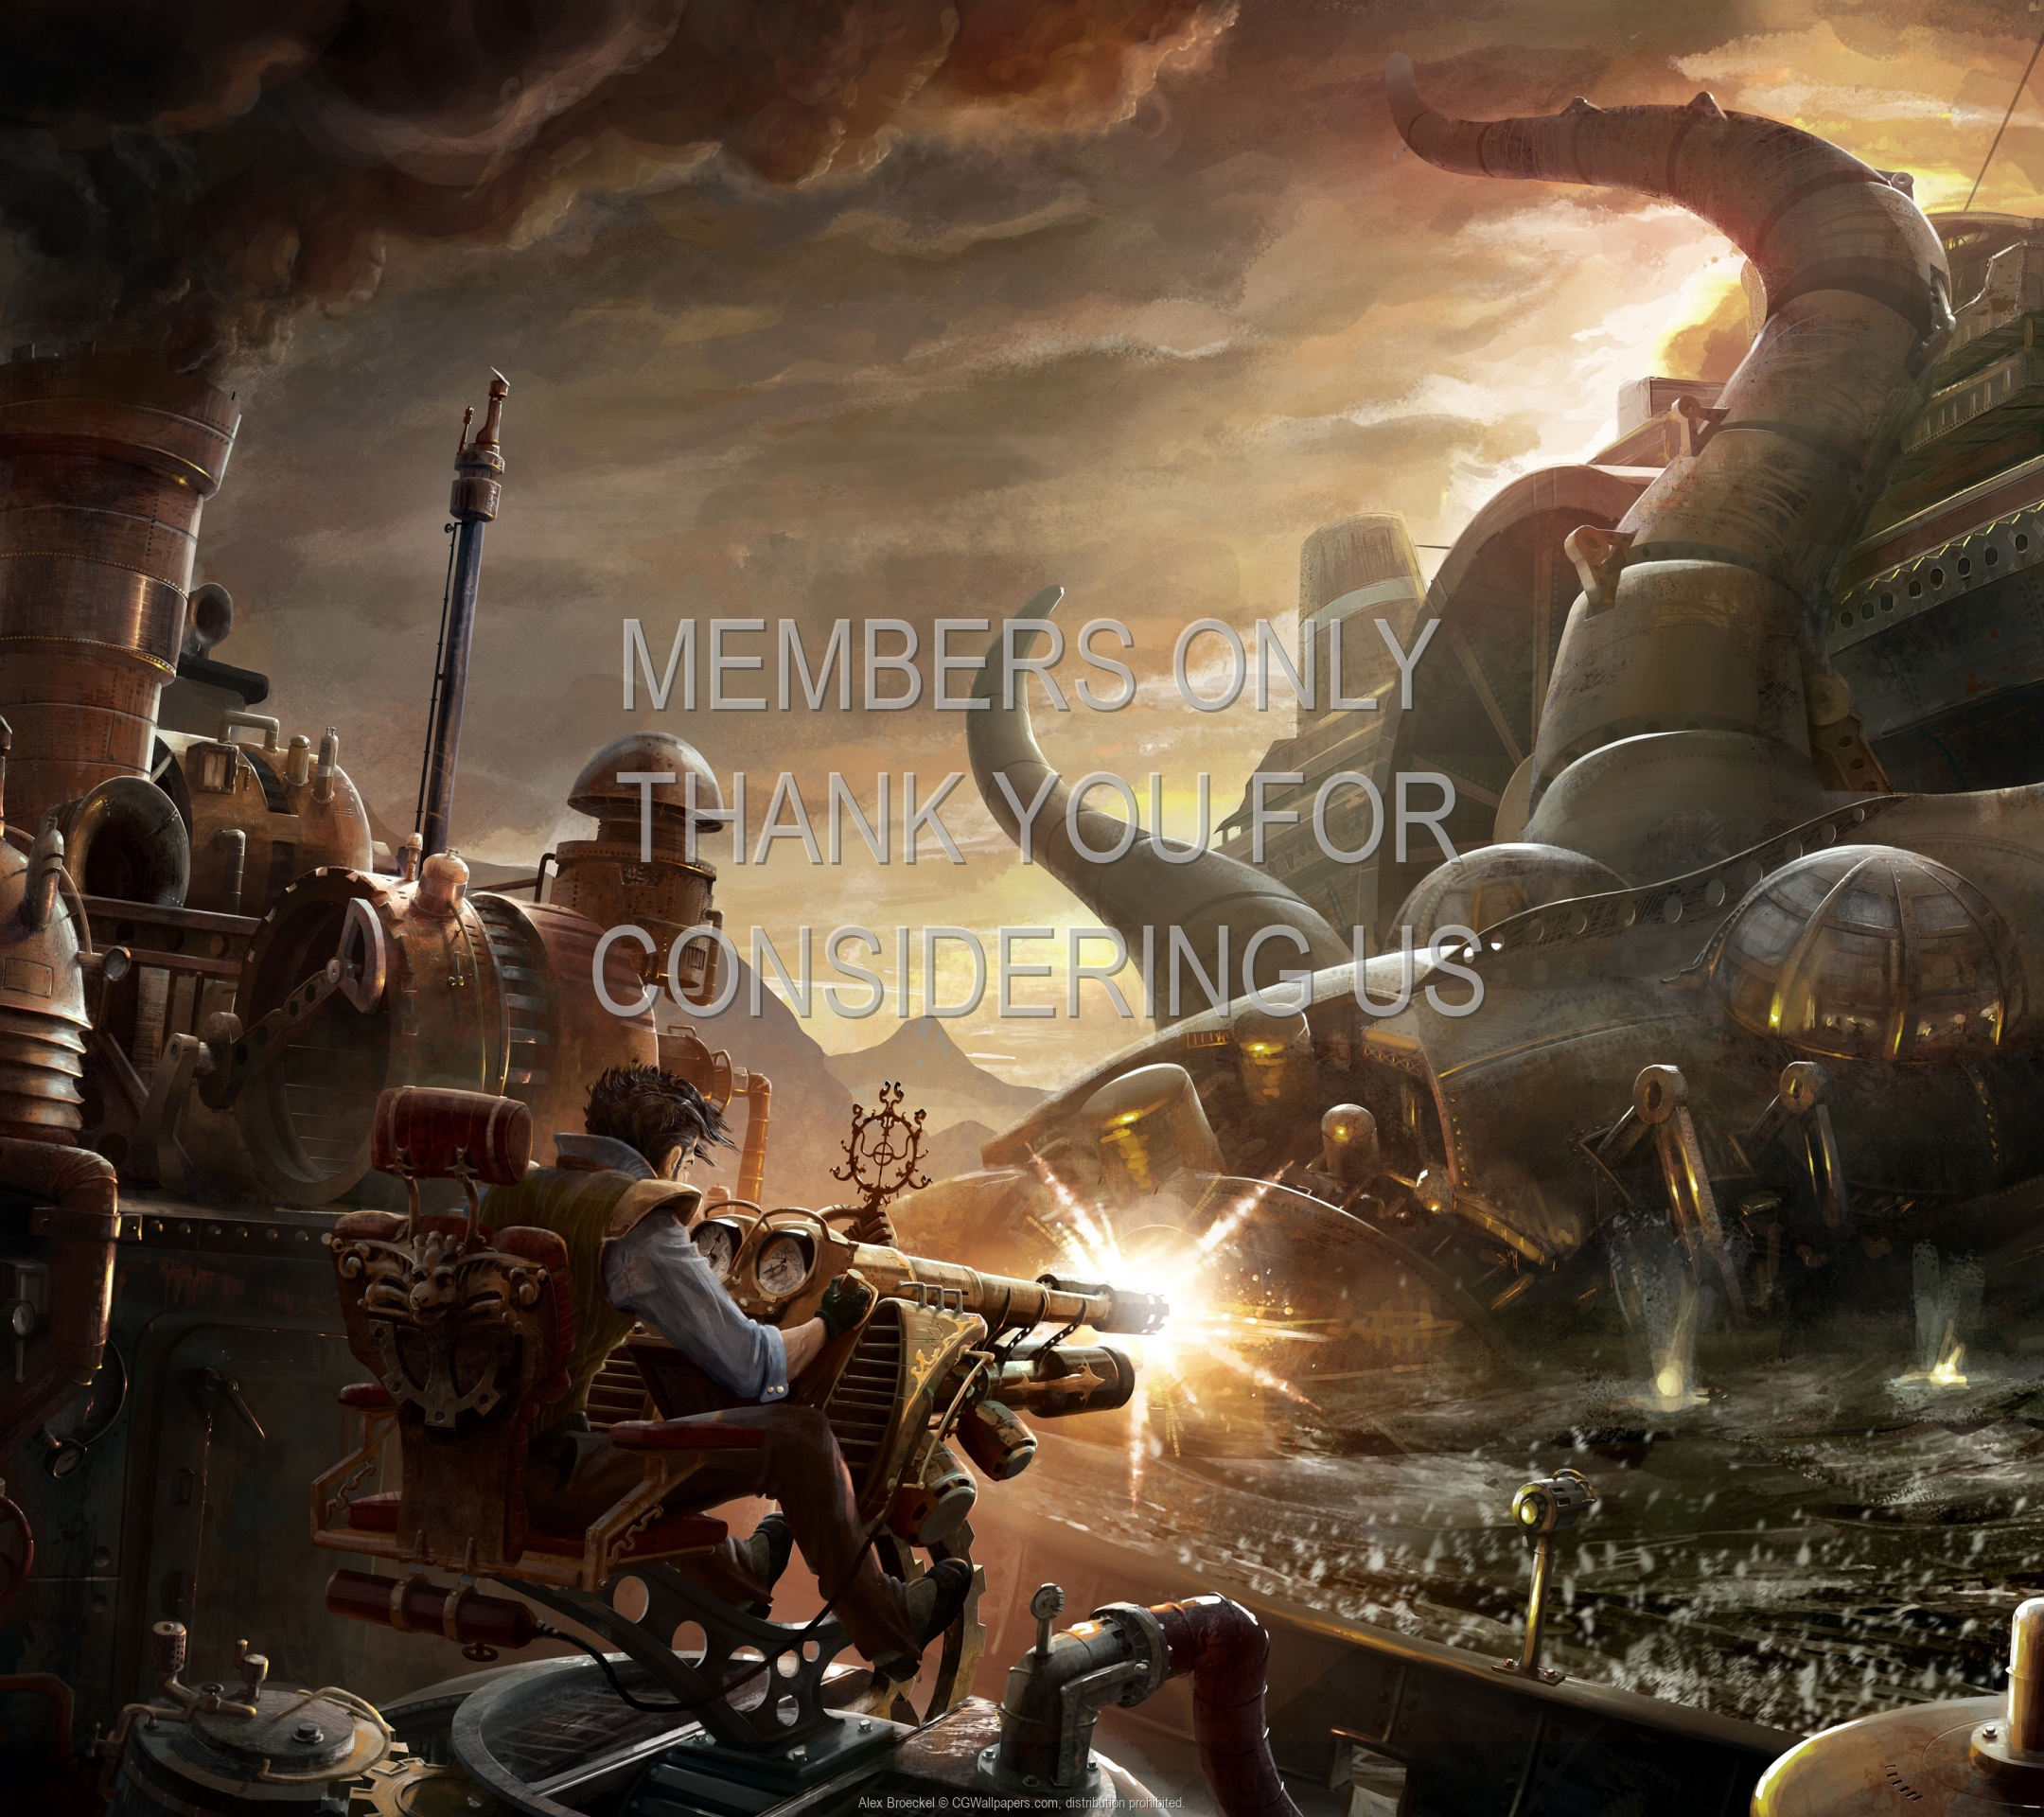 Alex Broeckel 1080p Horizontal Mobile wallpaper or background 02